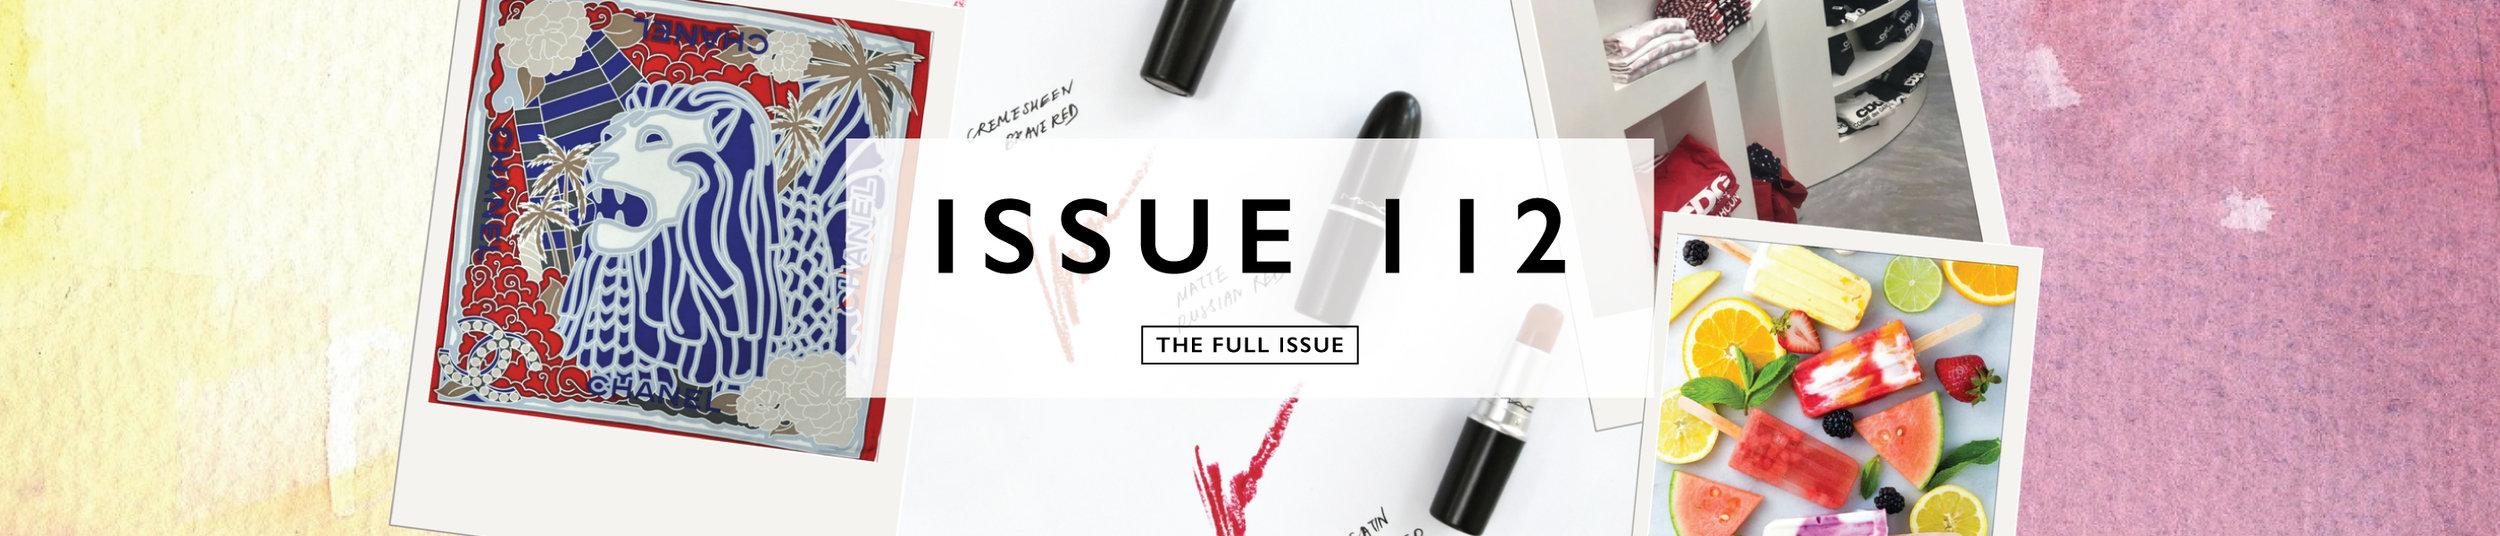 issue112.jpeg